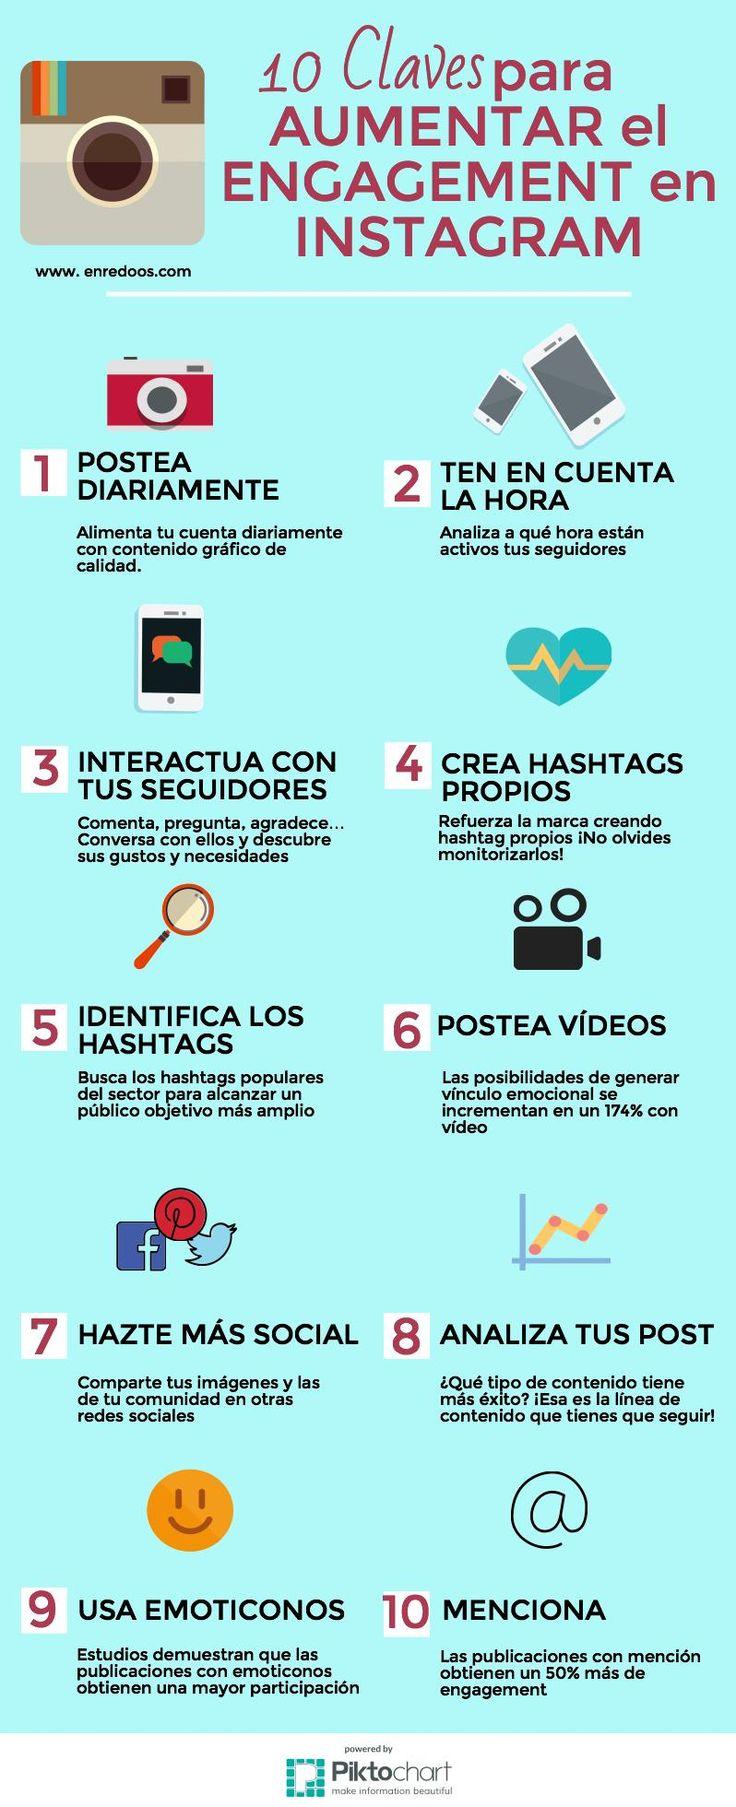 10 claves para aumentar el engagement en Instagram #infografia #socialmedia